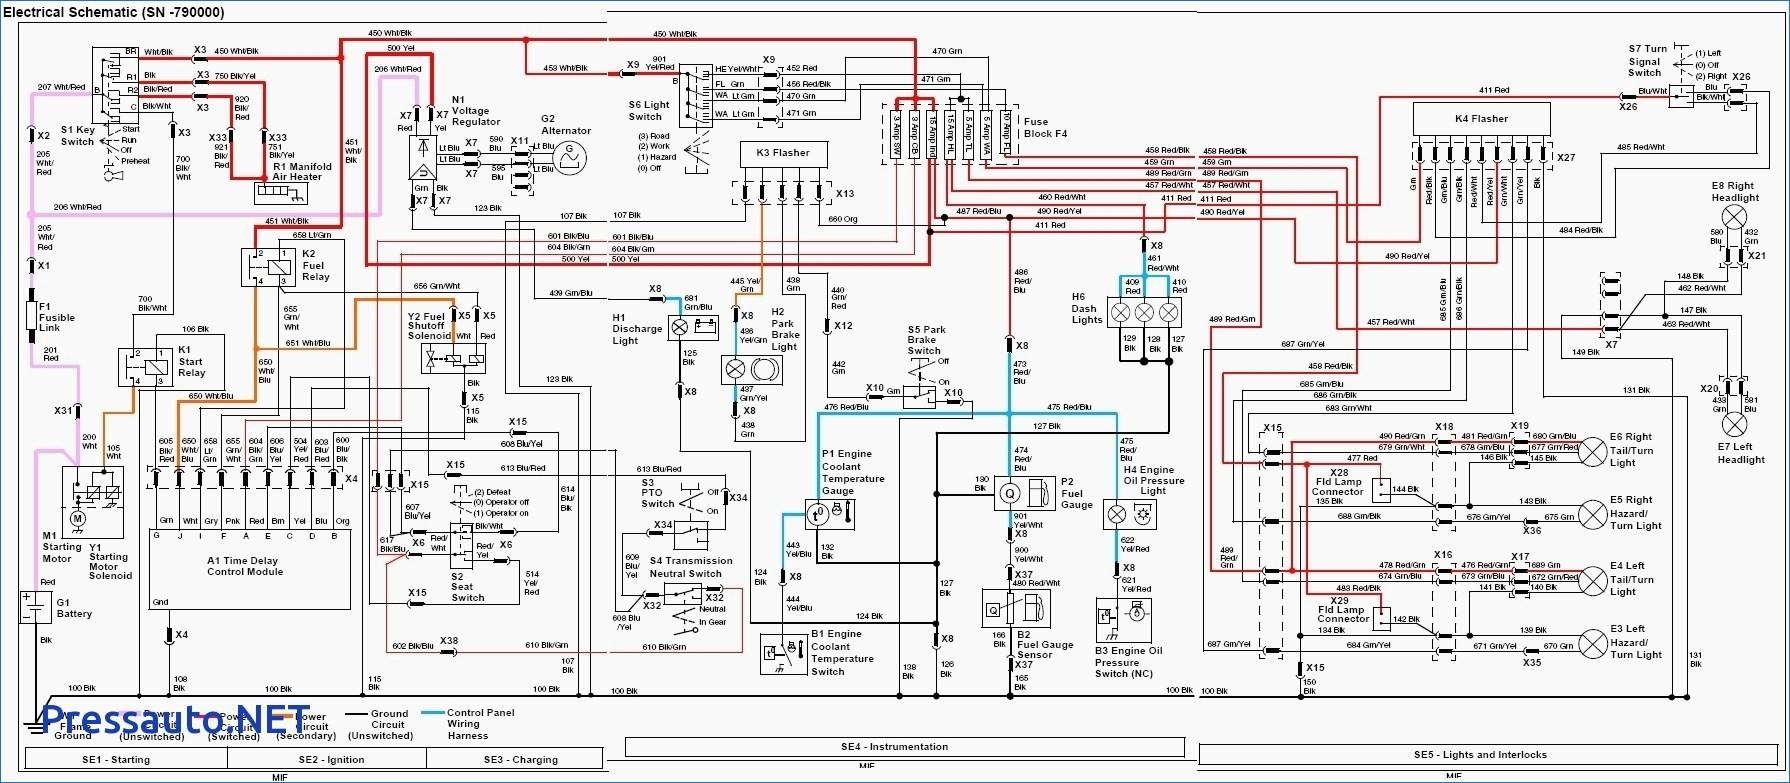 Wiring Diagram Database  John Deere 4440 Wiring Diagram